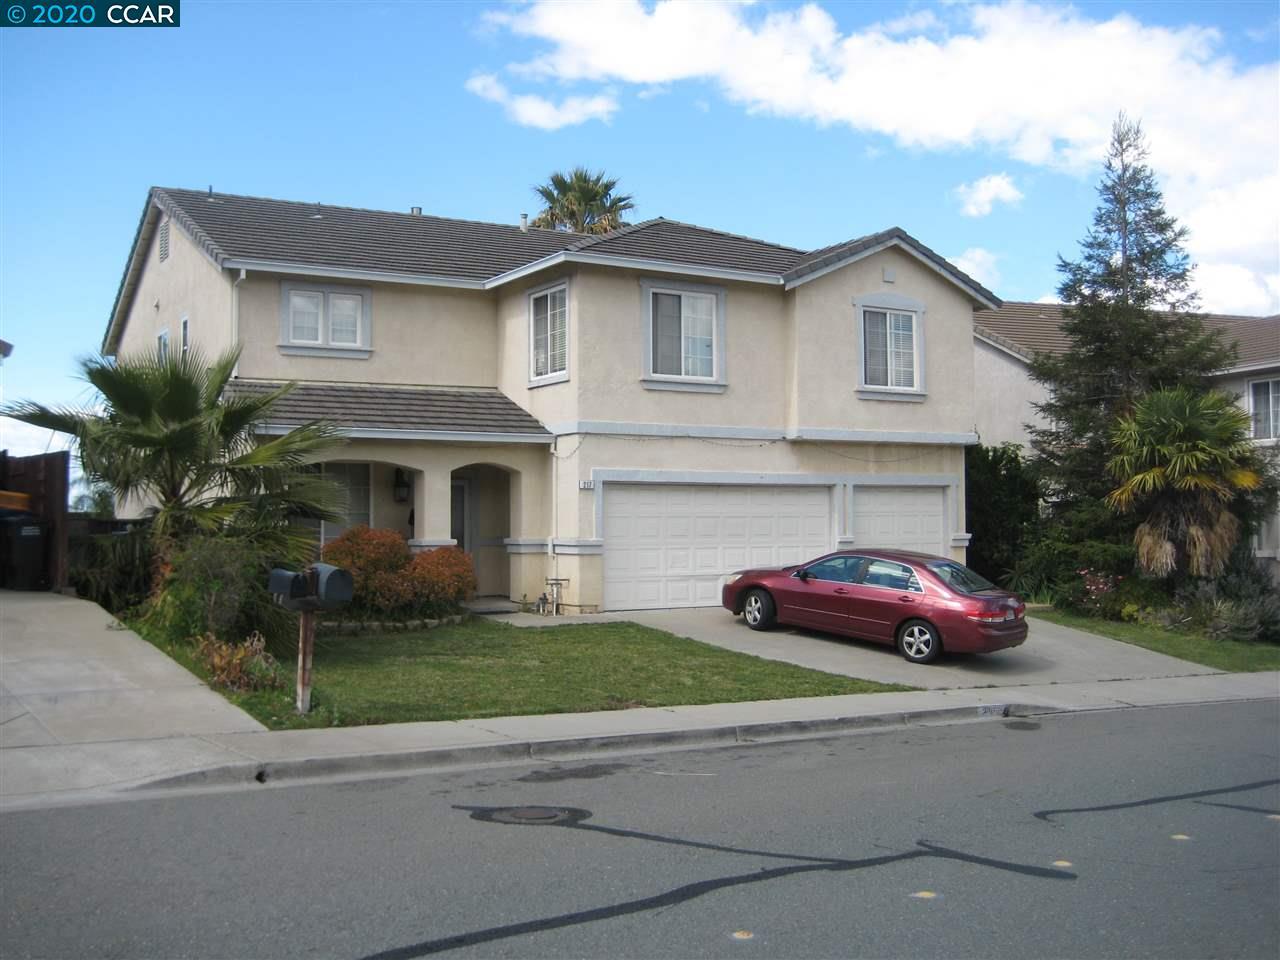 217 Cloverbrook Cir, PITTSBURG, CA 94565